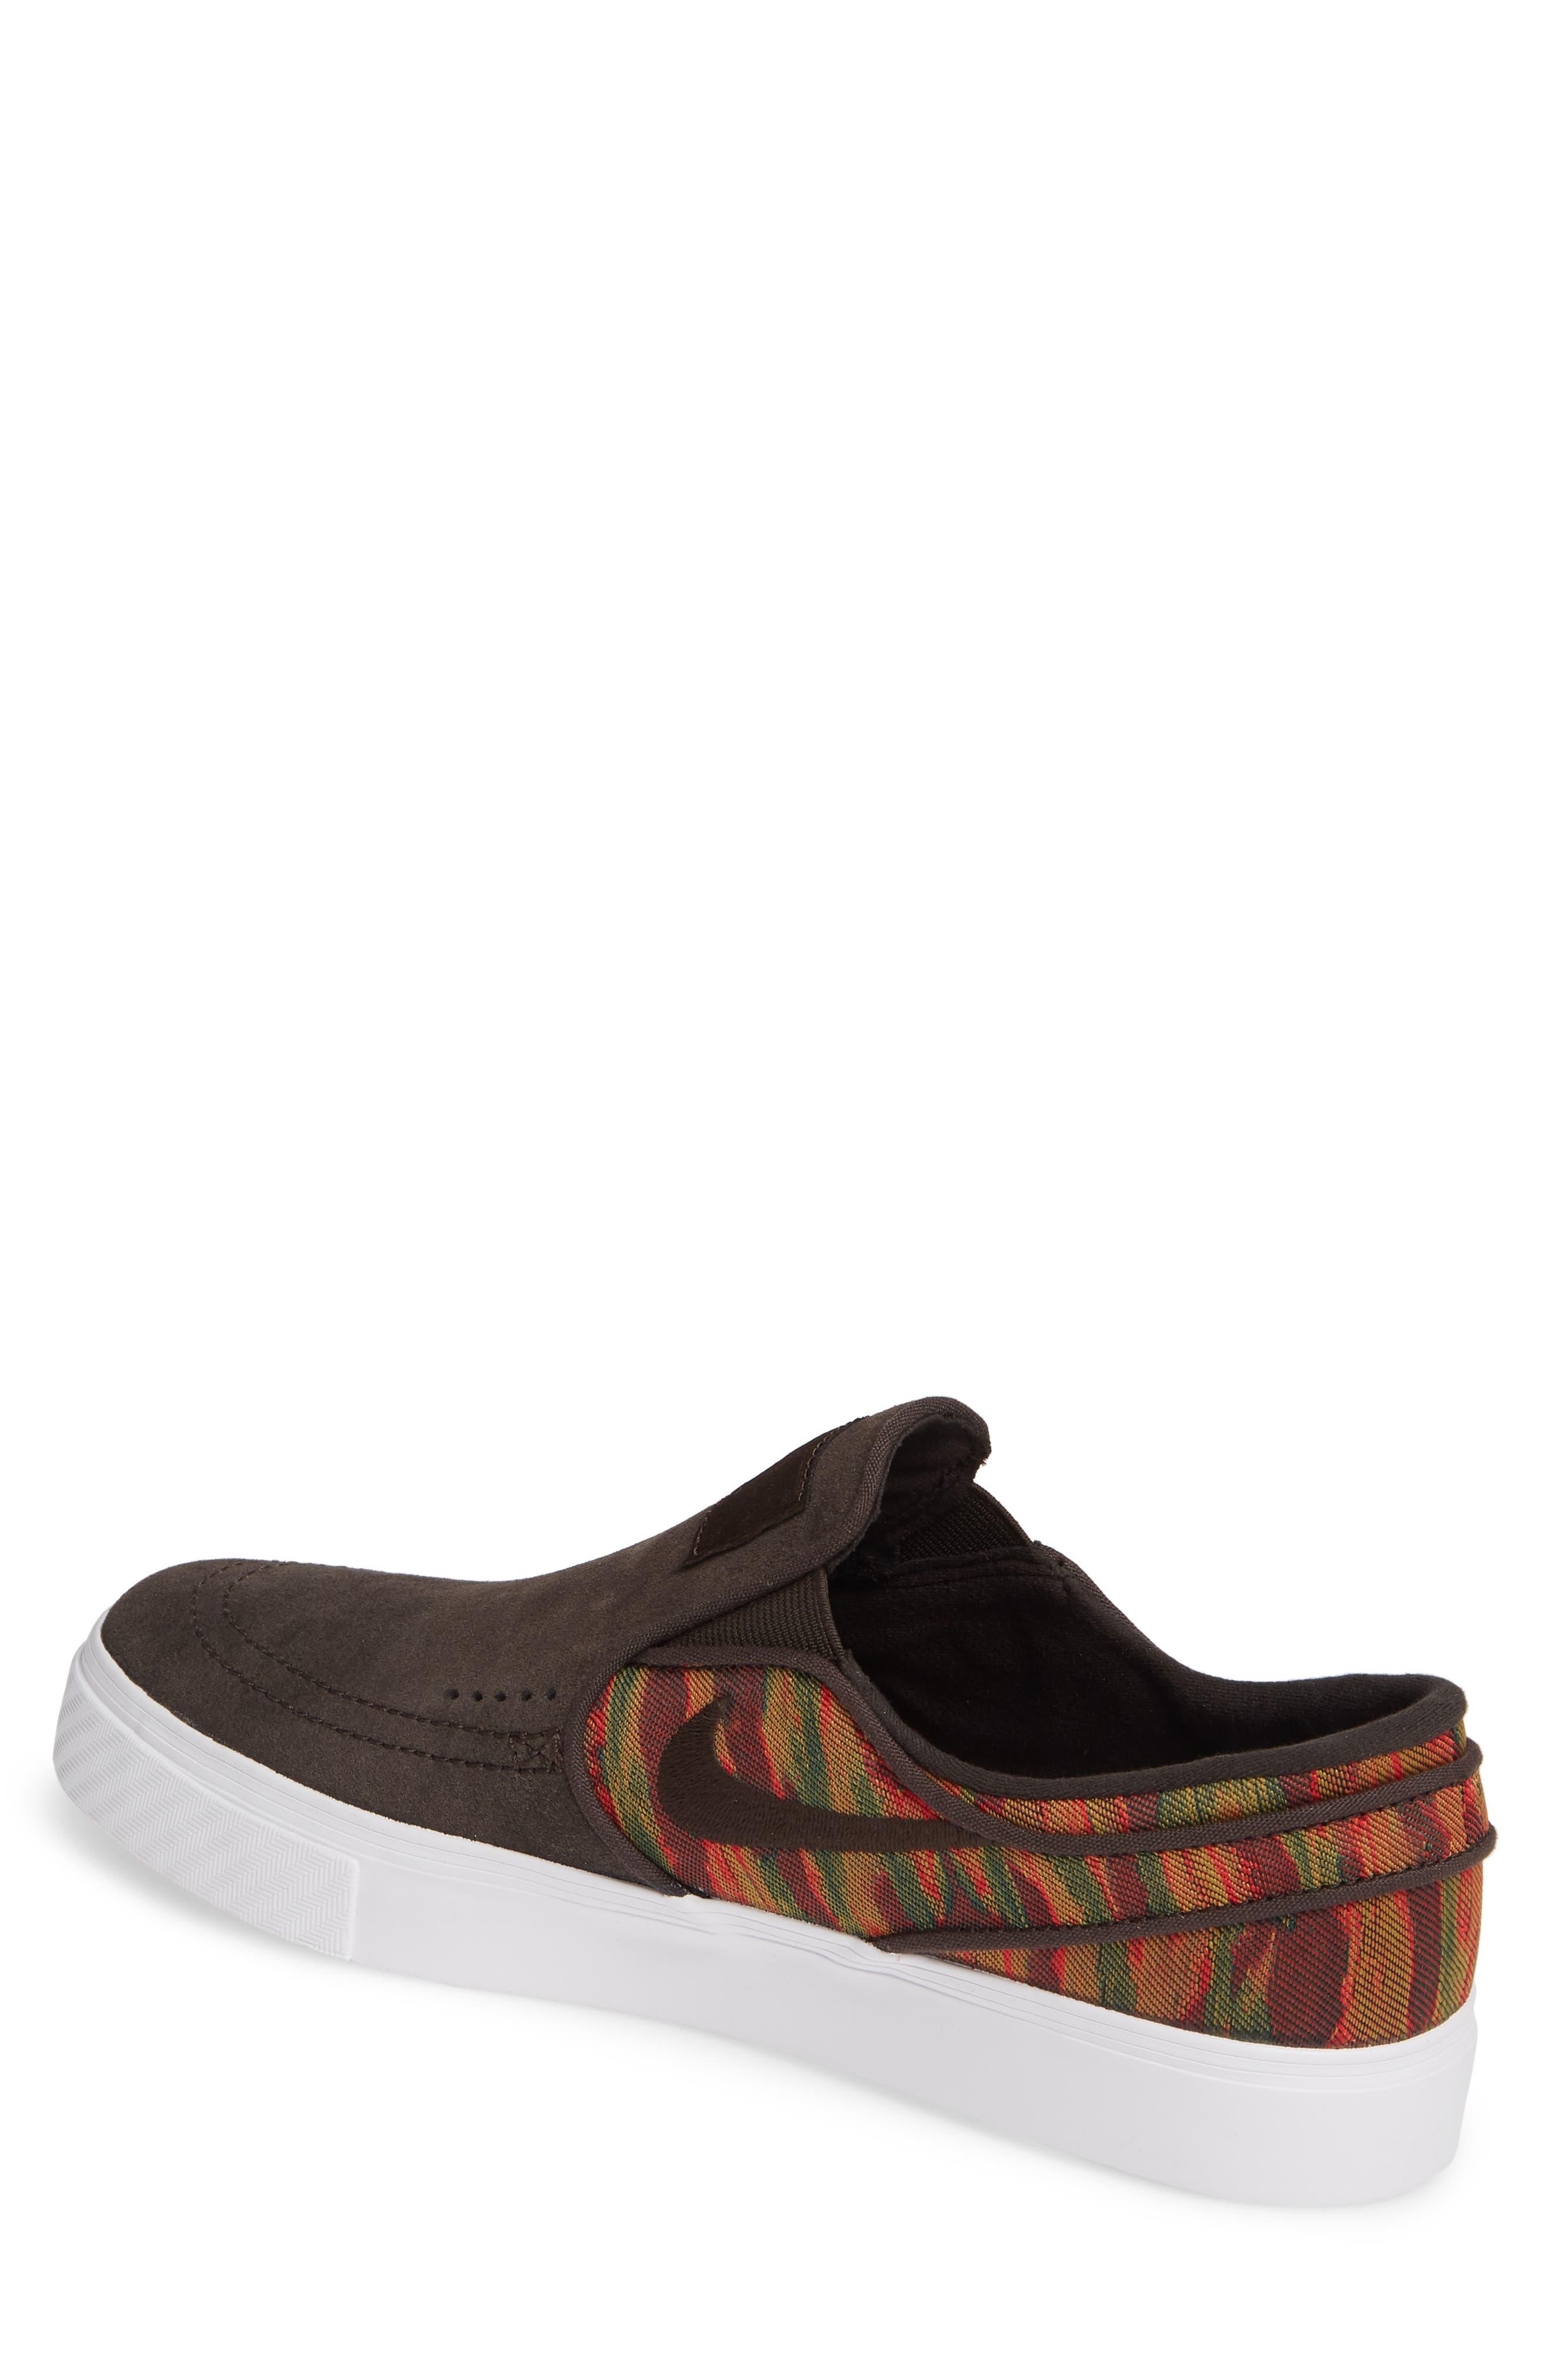 ,                             'SB Zoom Stefan Janoski' Slip-On Premium Sneaker,                             Alternate thumbnail 2, color,                             200